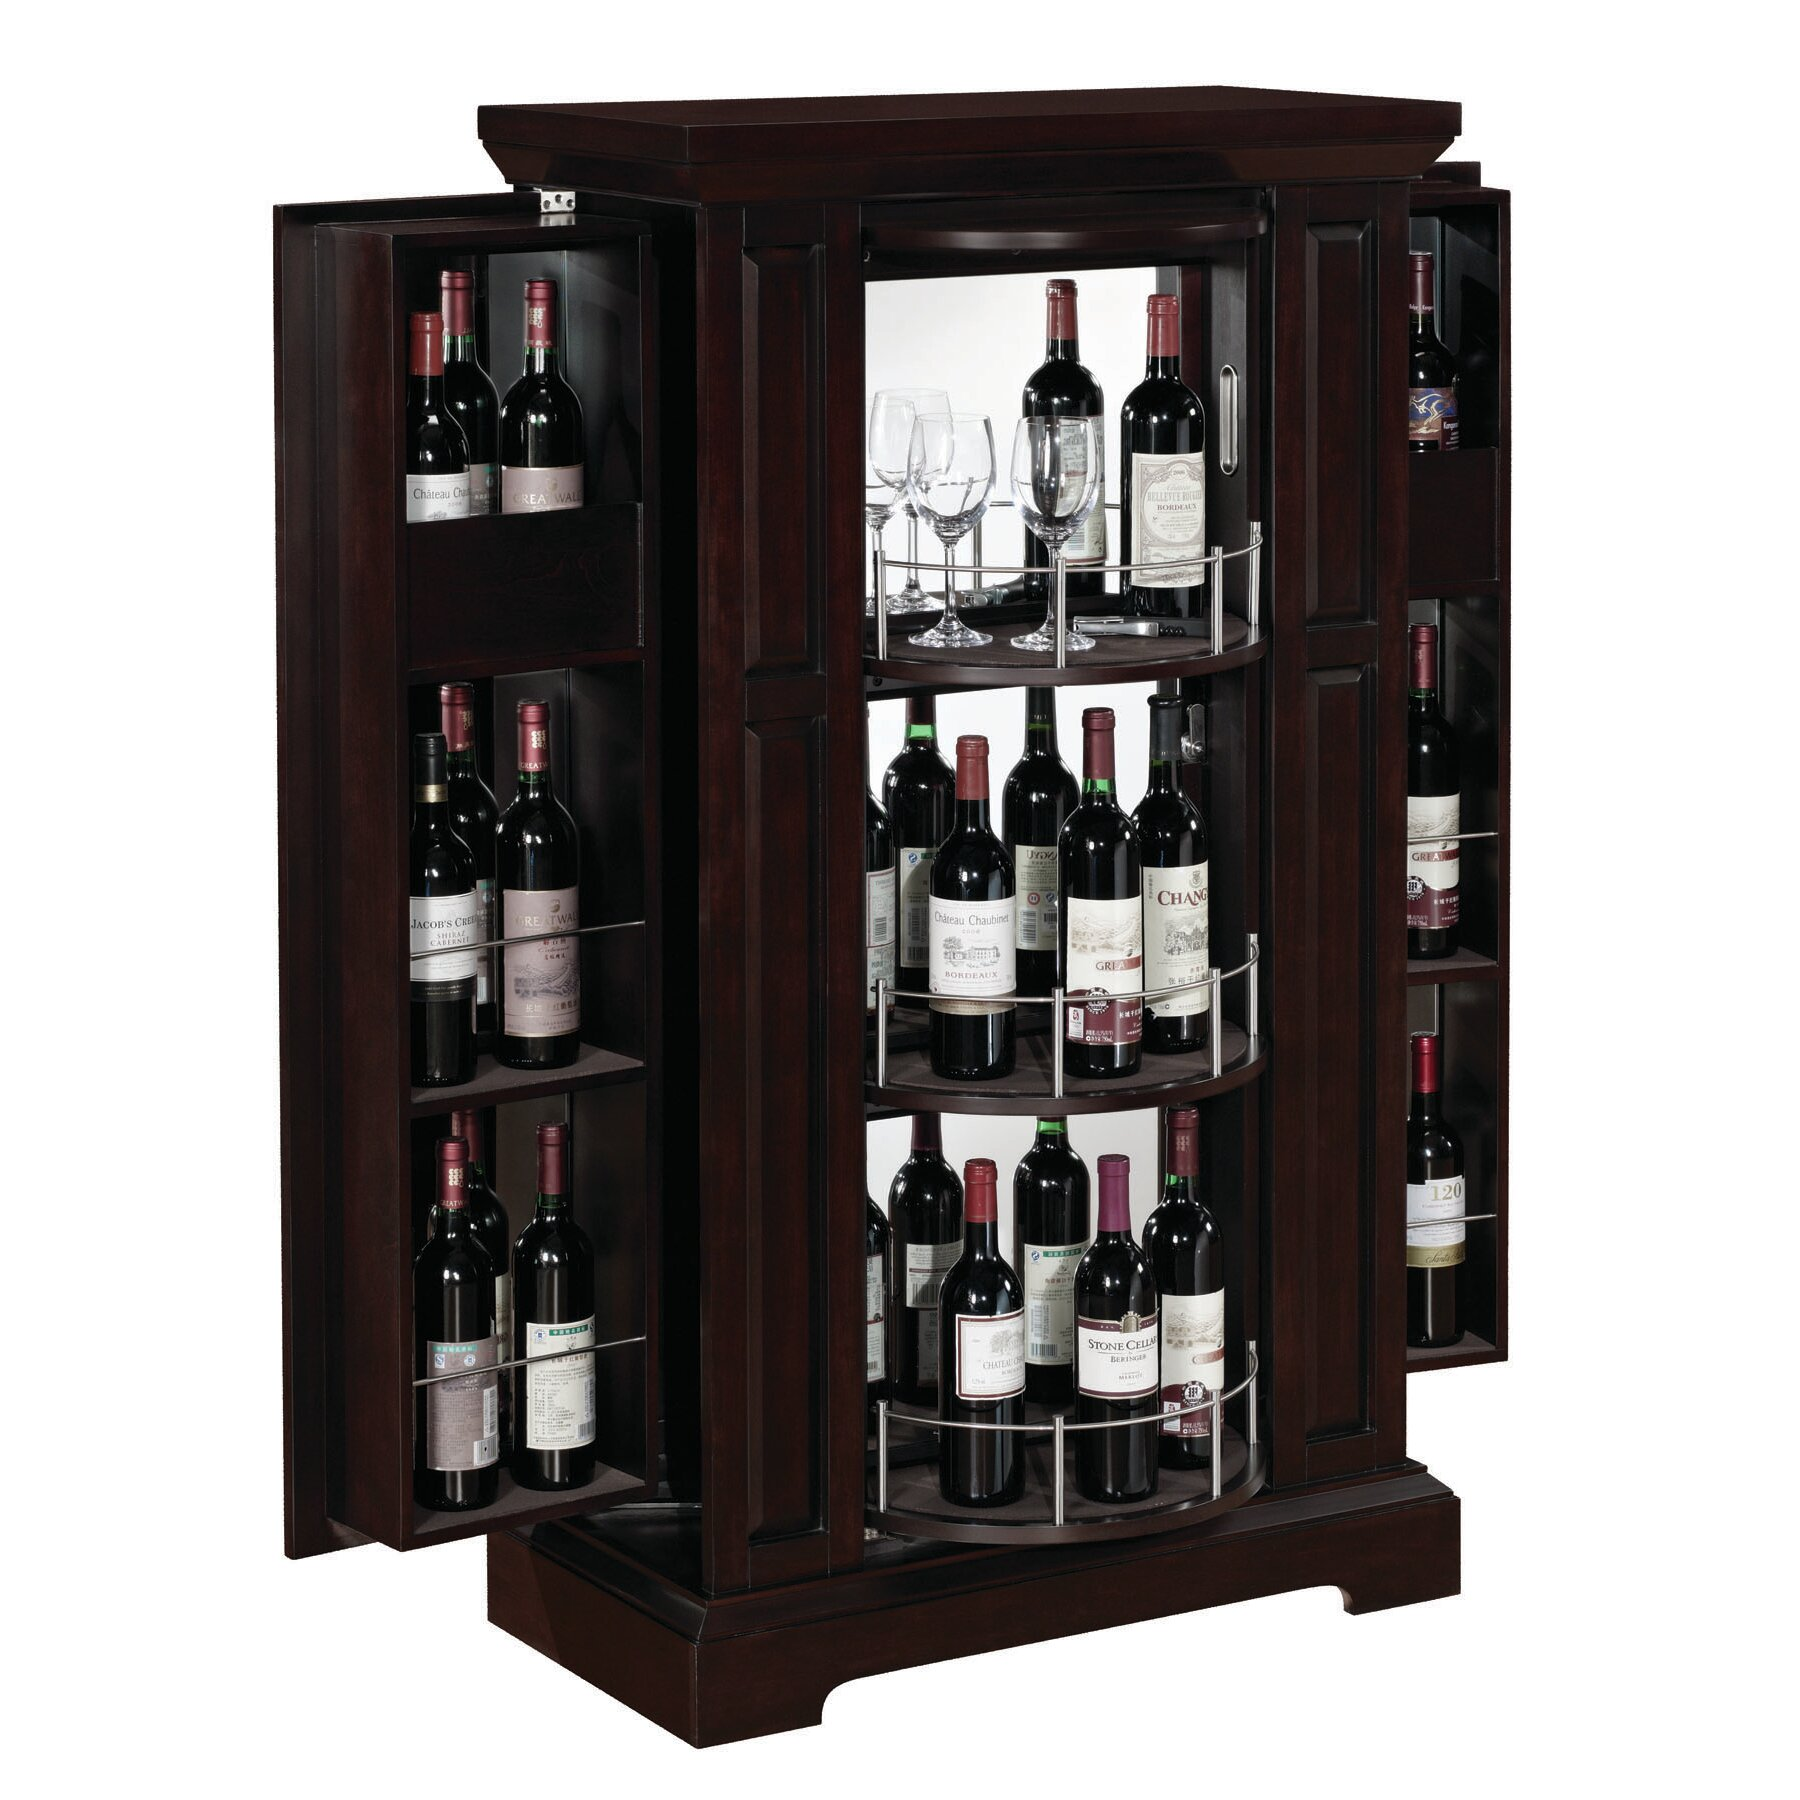 Wine Bar Storage Cabinet Tresanti Metro Bar Cabinet With Wine Storage Reviews Wayfair